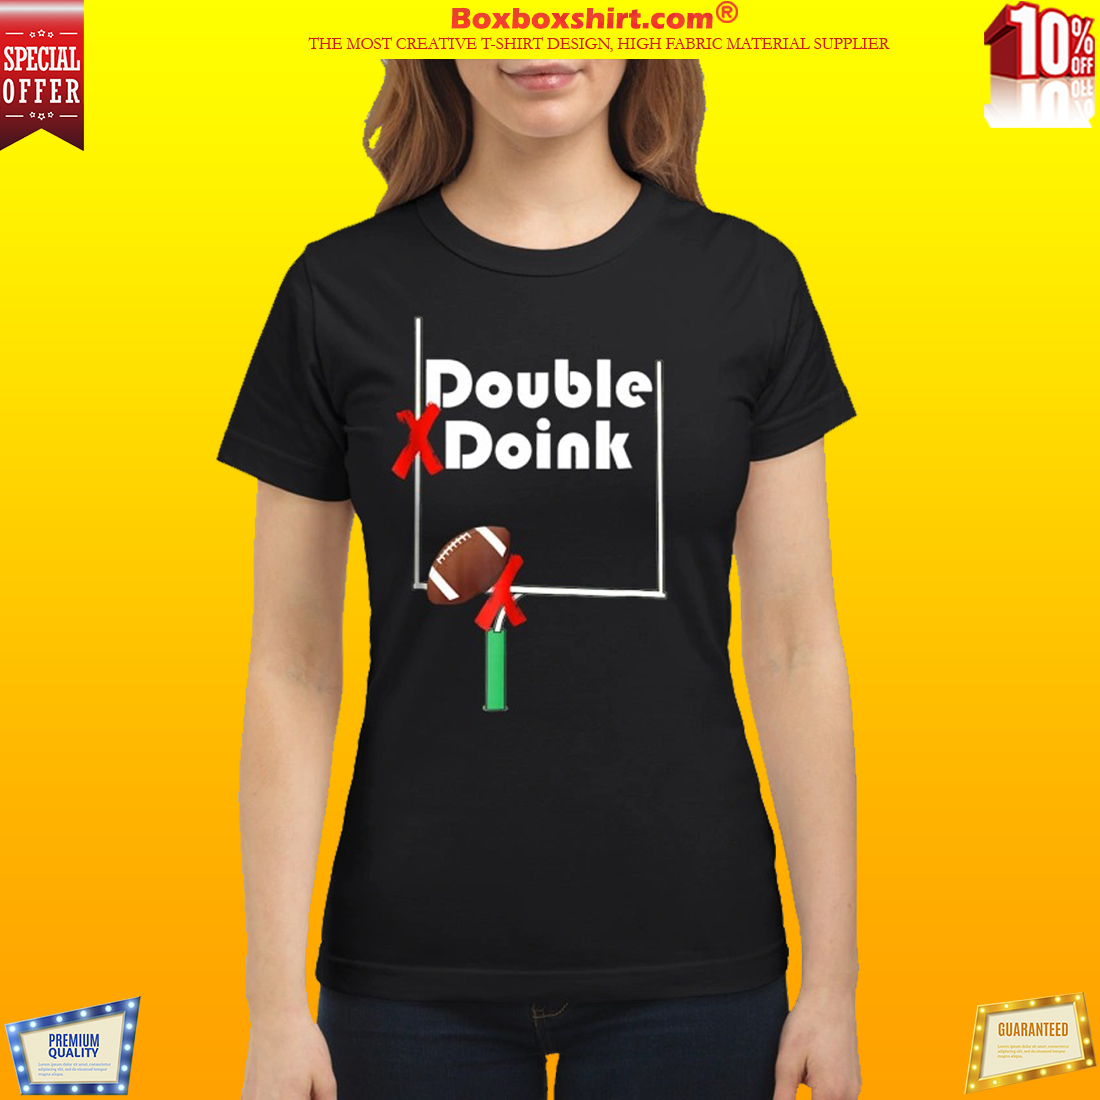 Double Doink Football classic shirt